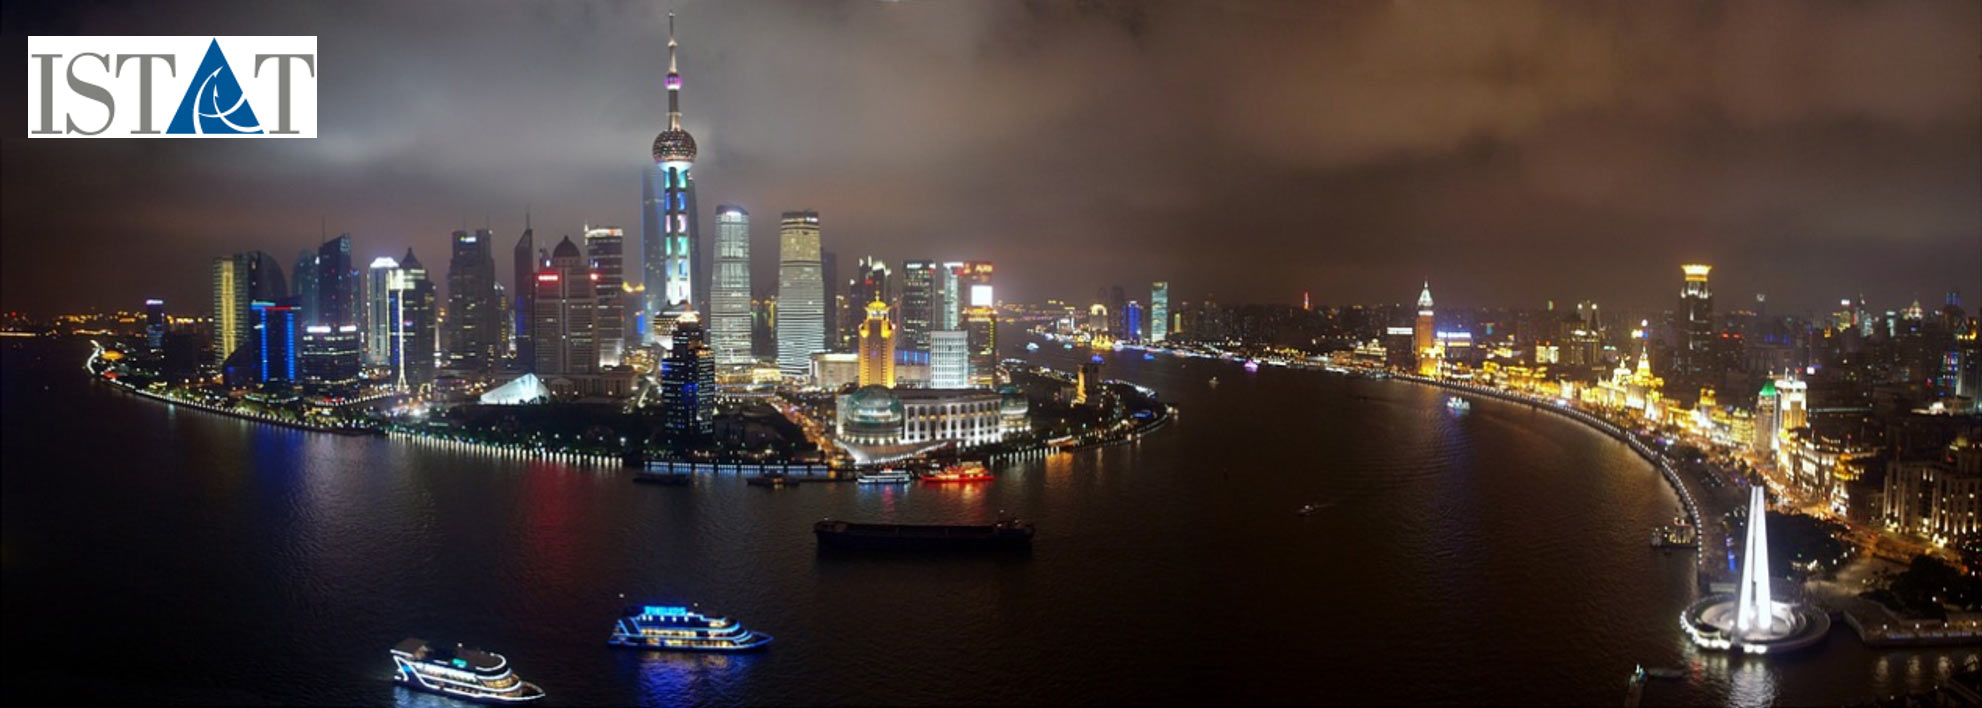 TrueNoord will be attending ISTAT Asia 2019 in Shanghai